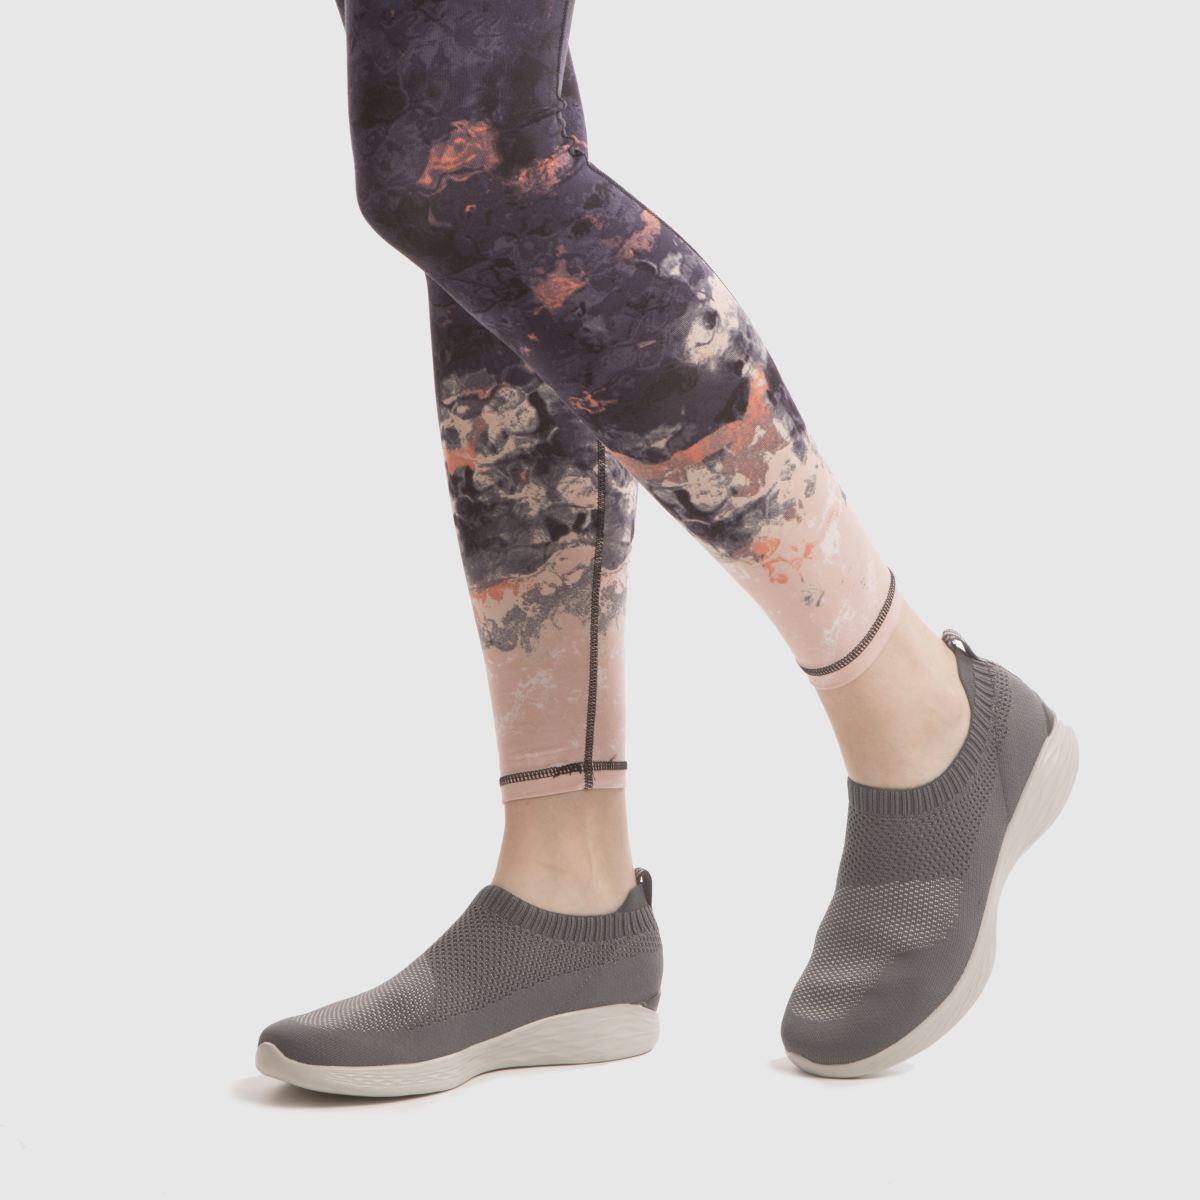 Damen schuh Dunkelgrau skechers You Pure Sneaker | schuh Damen Gute Qualität beliebte Schuhe 63ed28